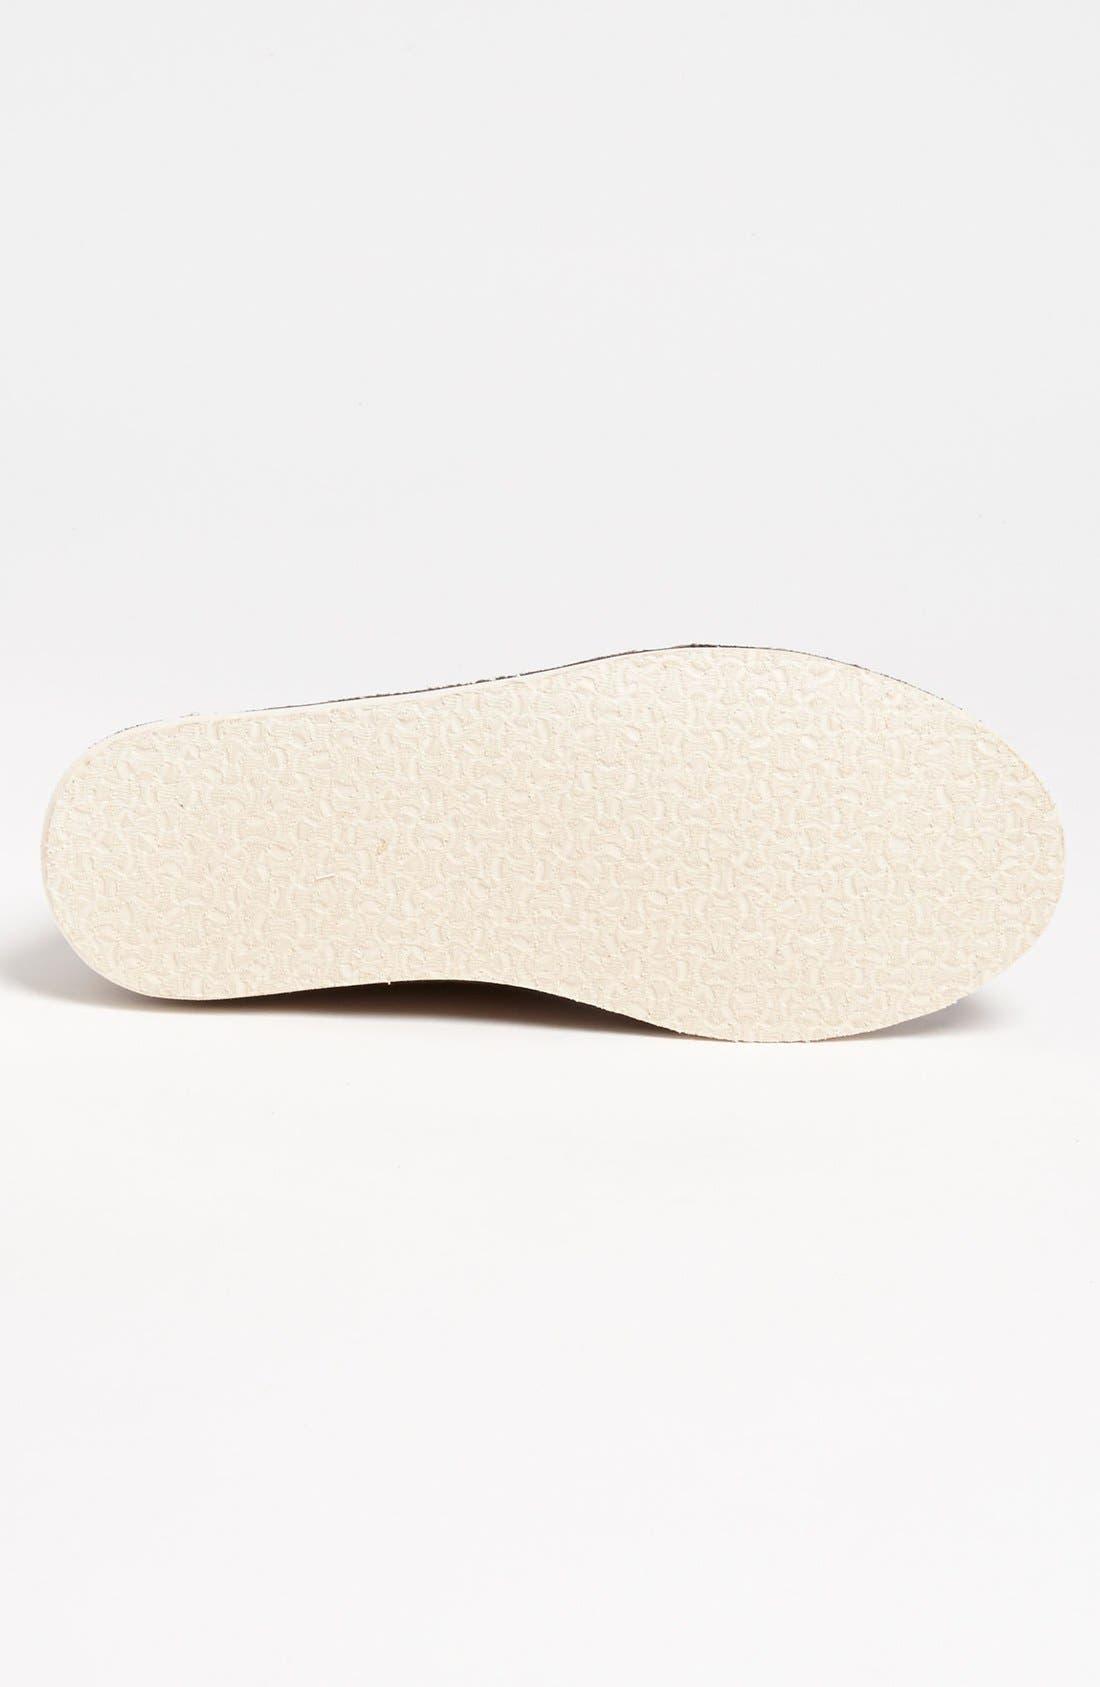 Alternate Image 4  - TOMS 'Desert' Perforated Suede Sneaker (Men)